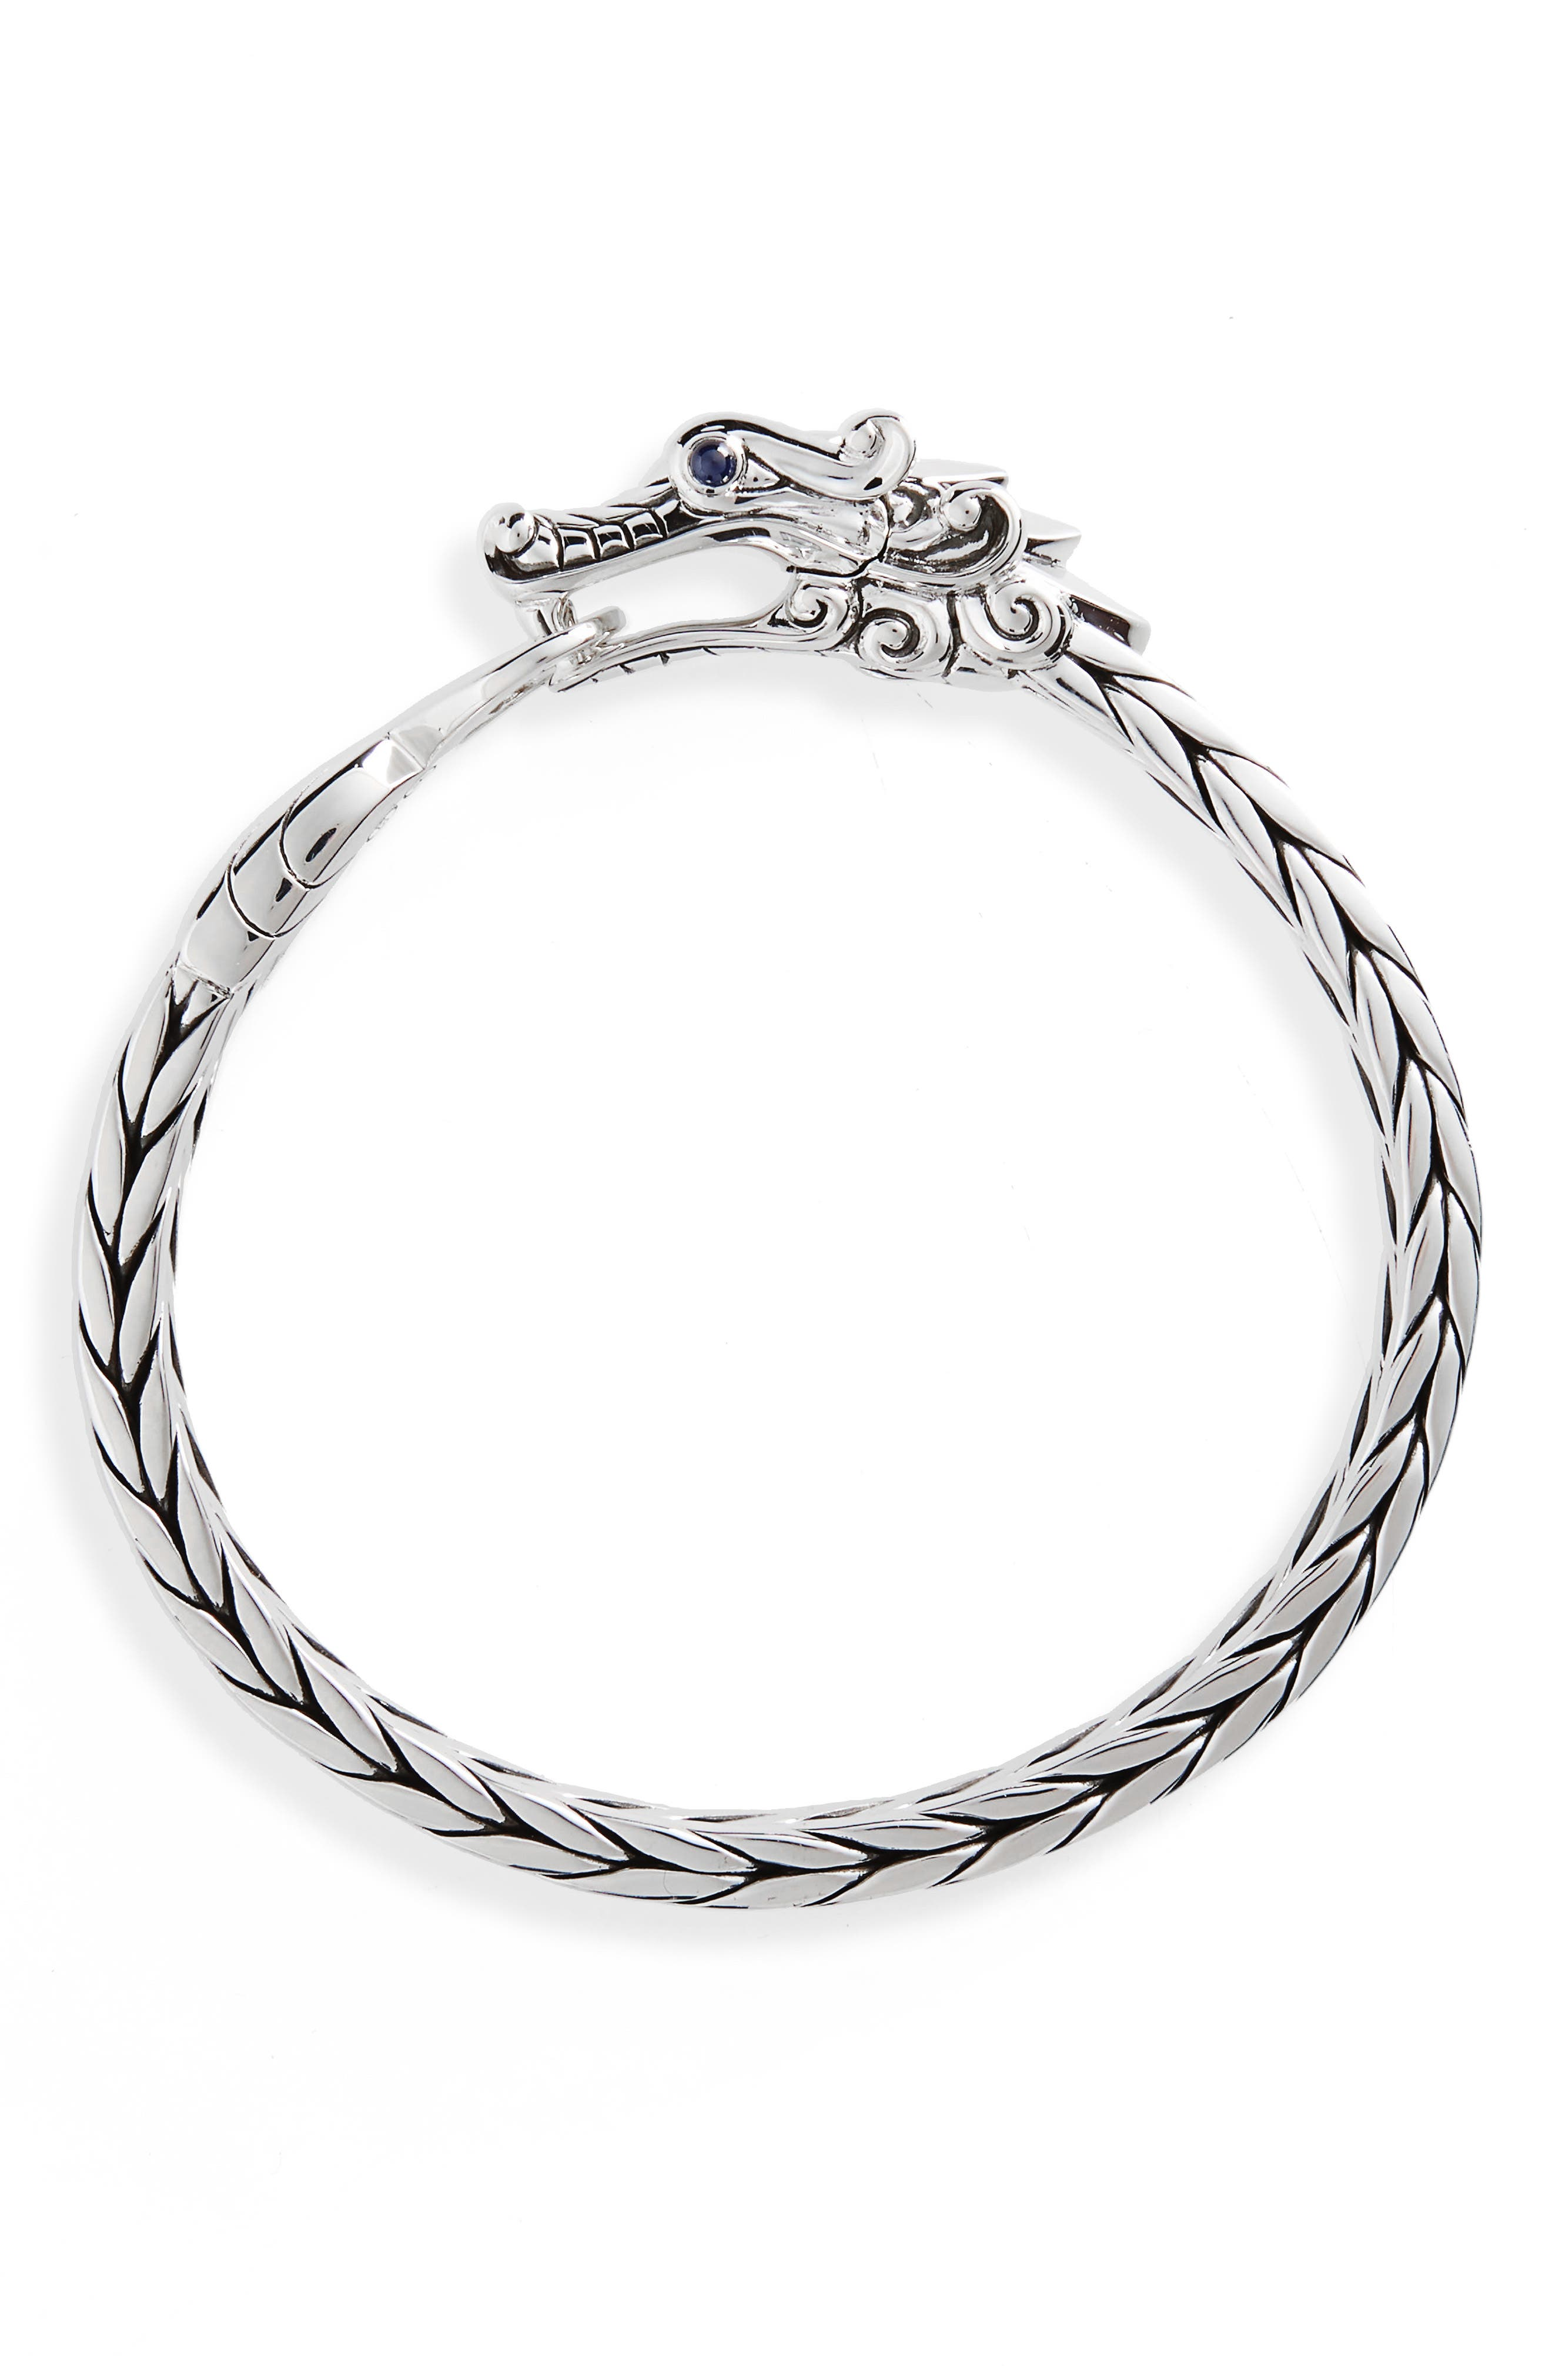 Legends Naga Sterling Silver Bracelet,                         Main,                         color, Silver/ Blue Sapphire